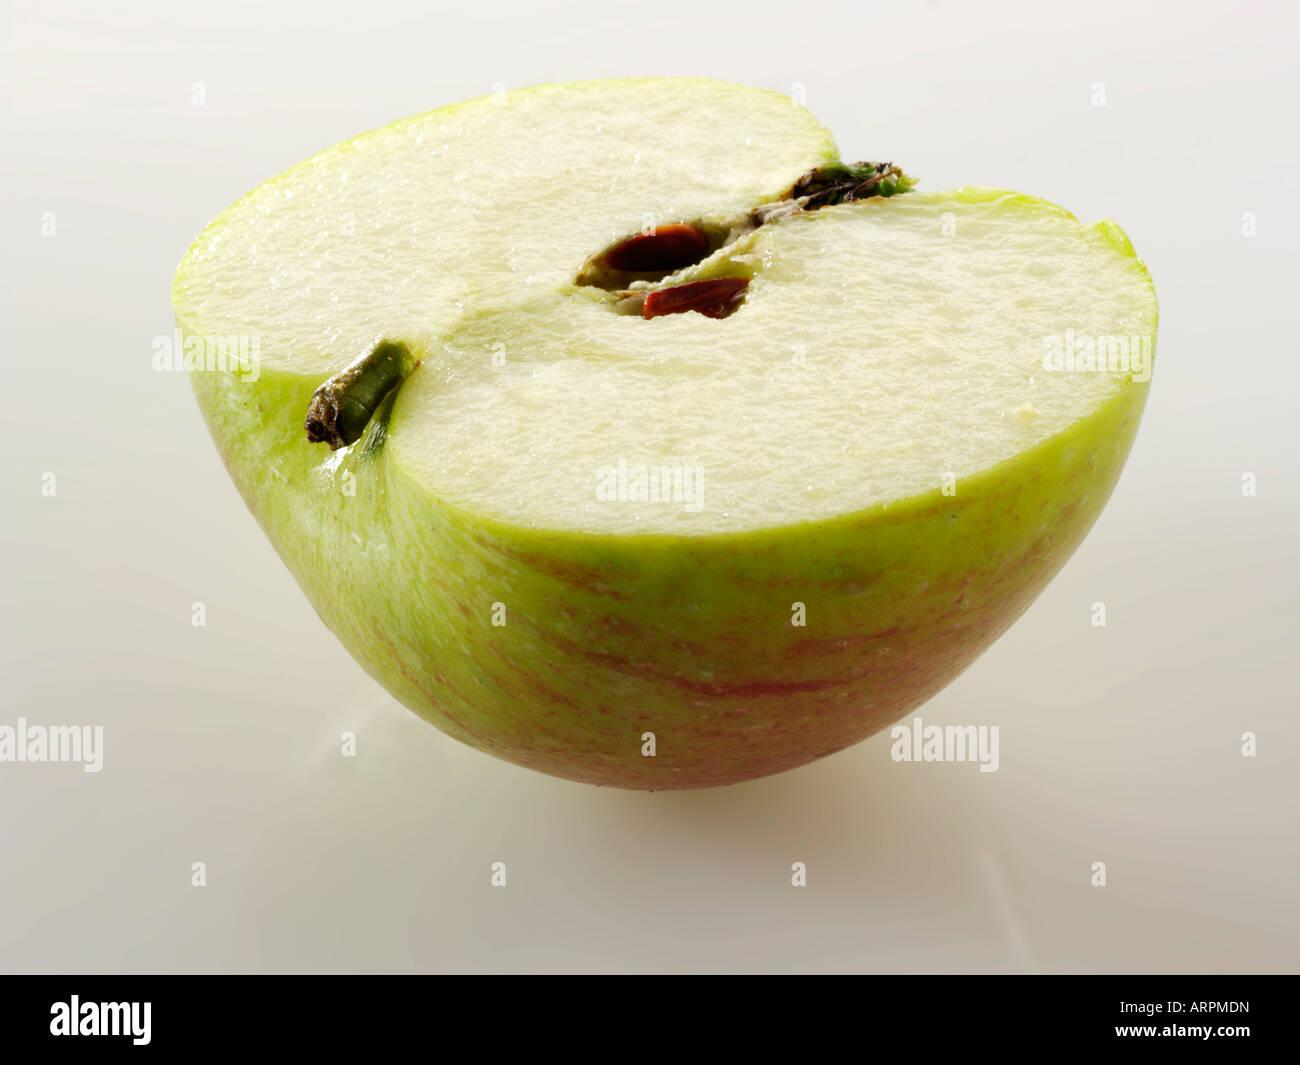 La Bramley apple - cut against white background Photo Stock